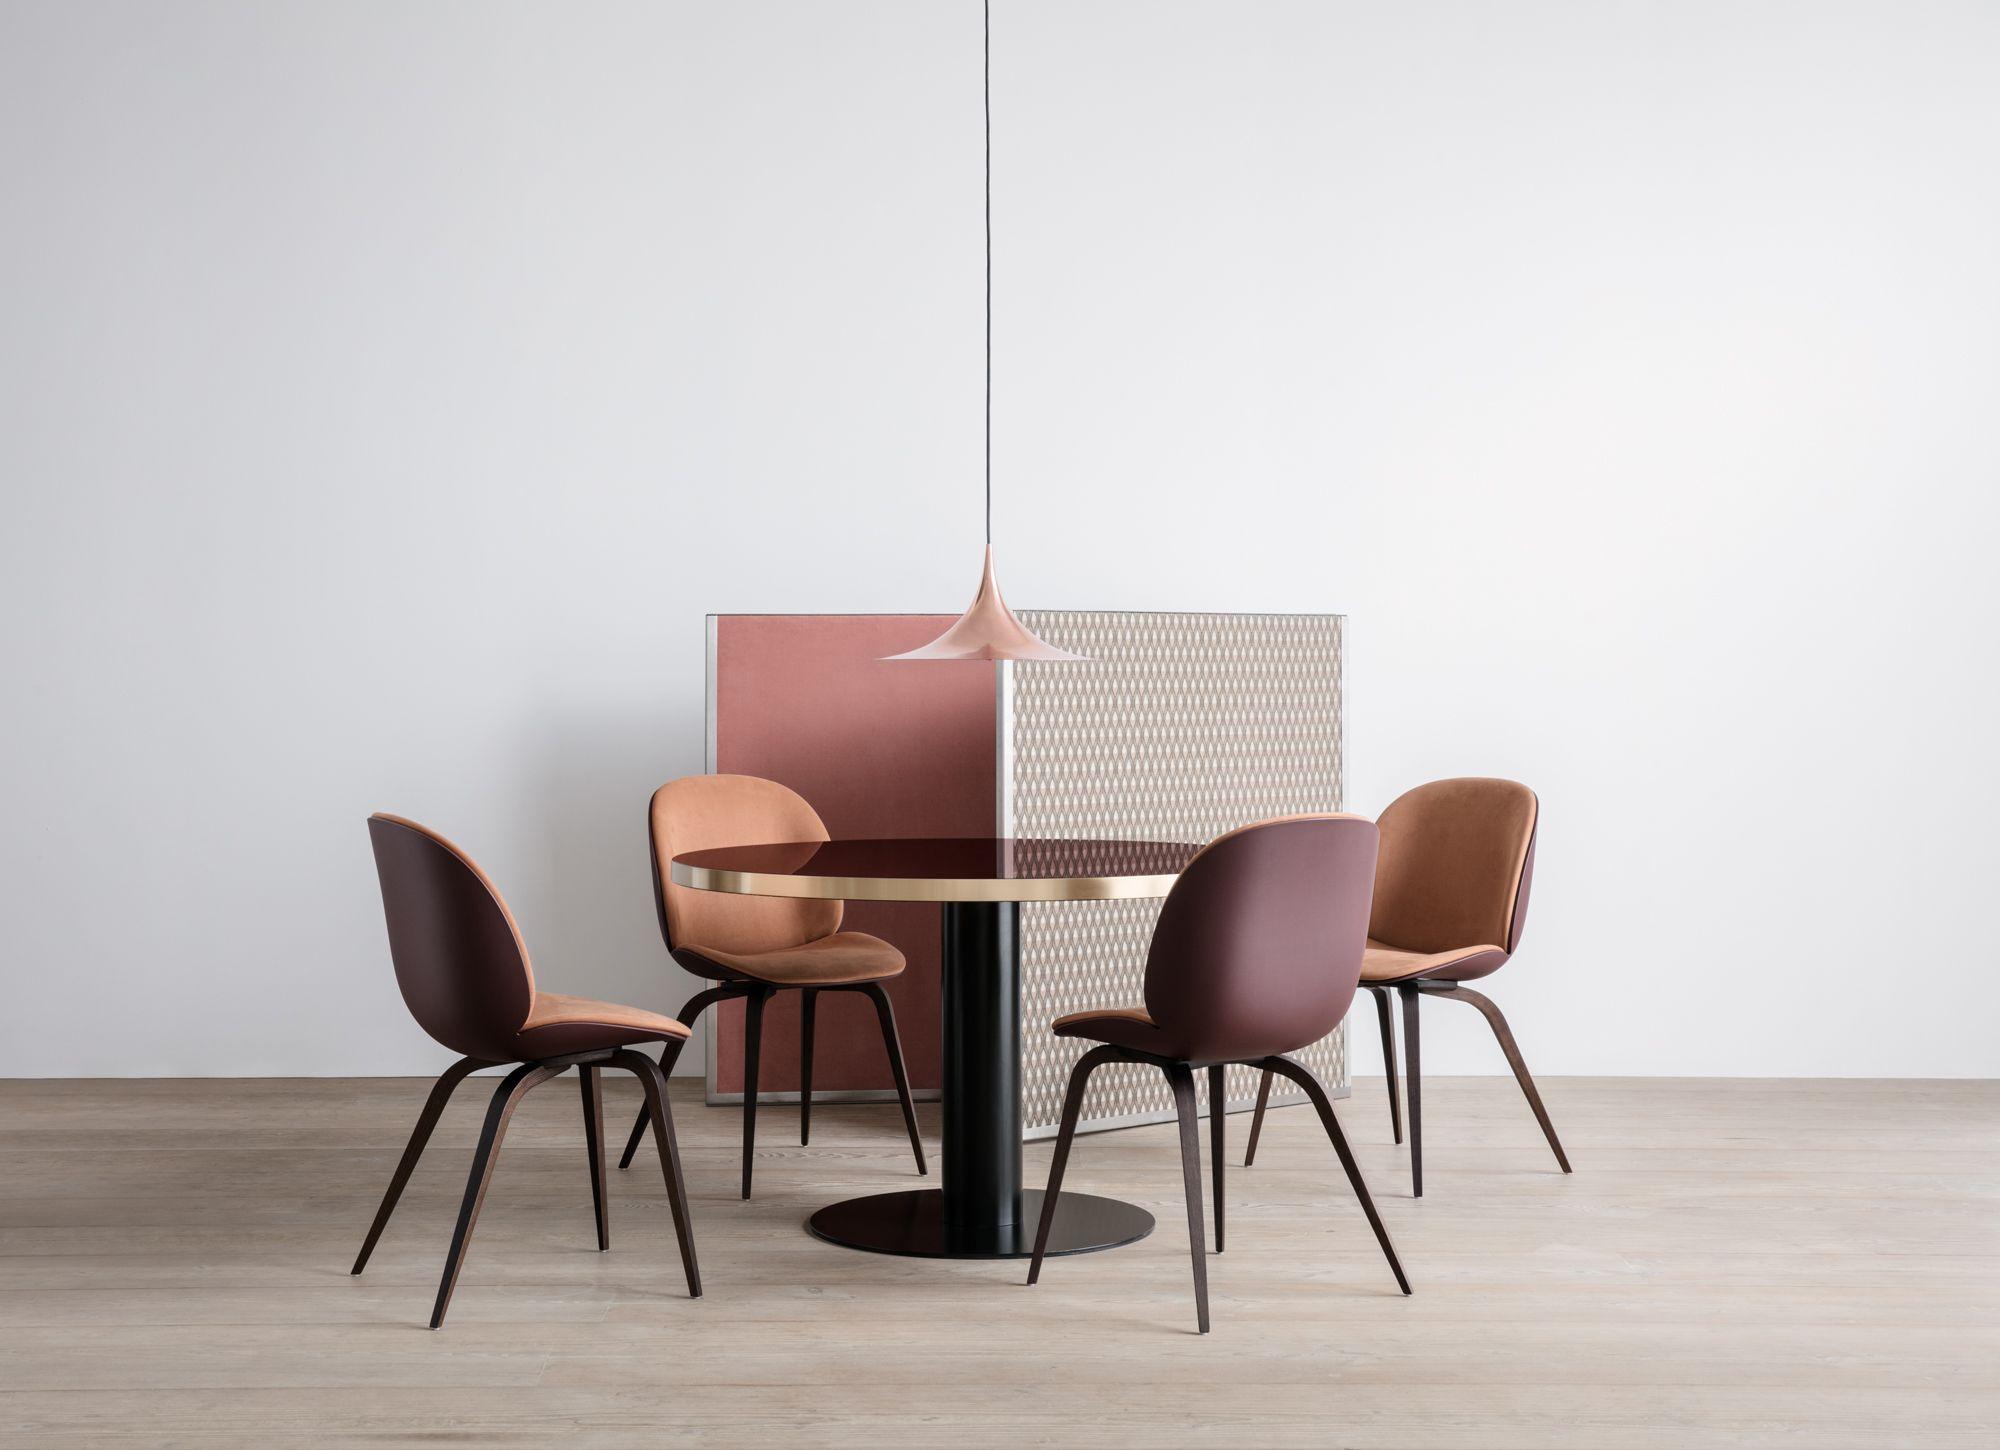 Gubi Beetle Chair Gubi 2 0 Dining Table Semi Pendant Round Table And Chairs Beetle Chair Chair